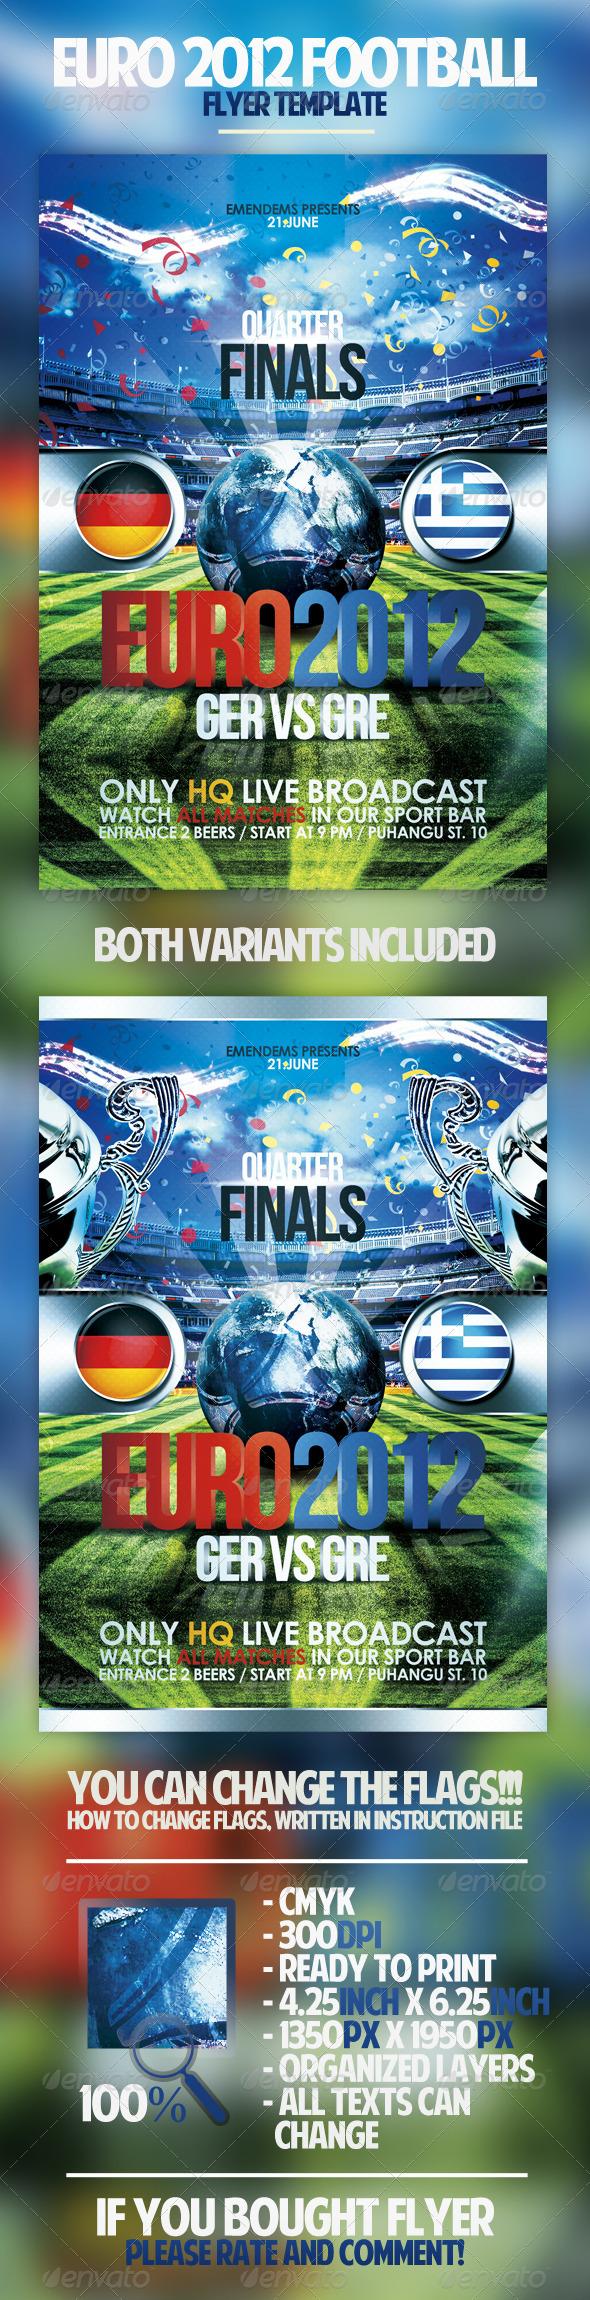 GraphicRiver Euro 2012 Football Flyer 2535268